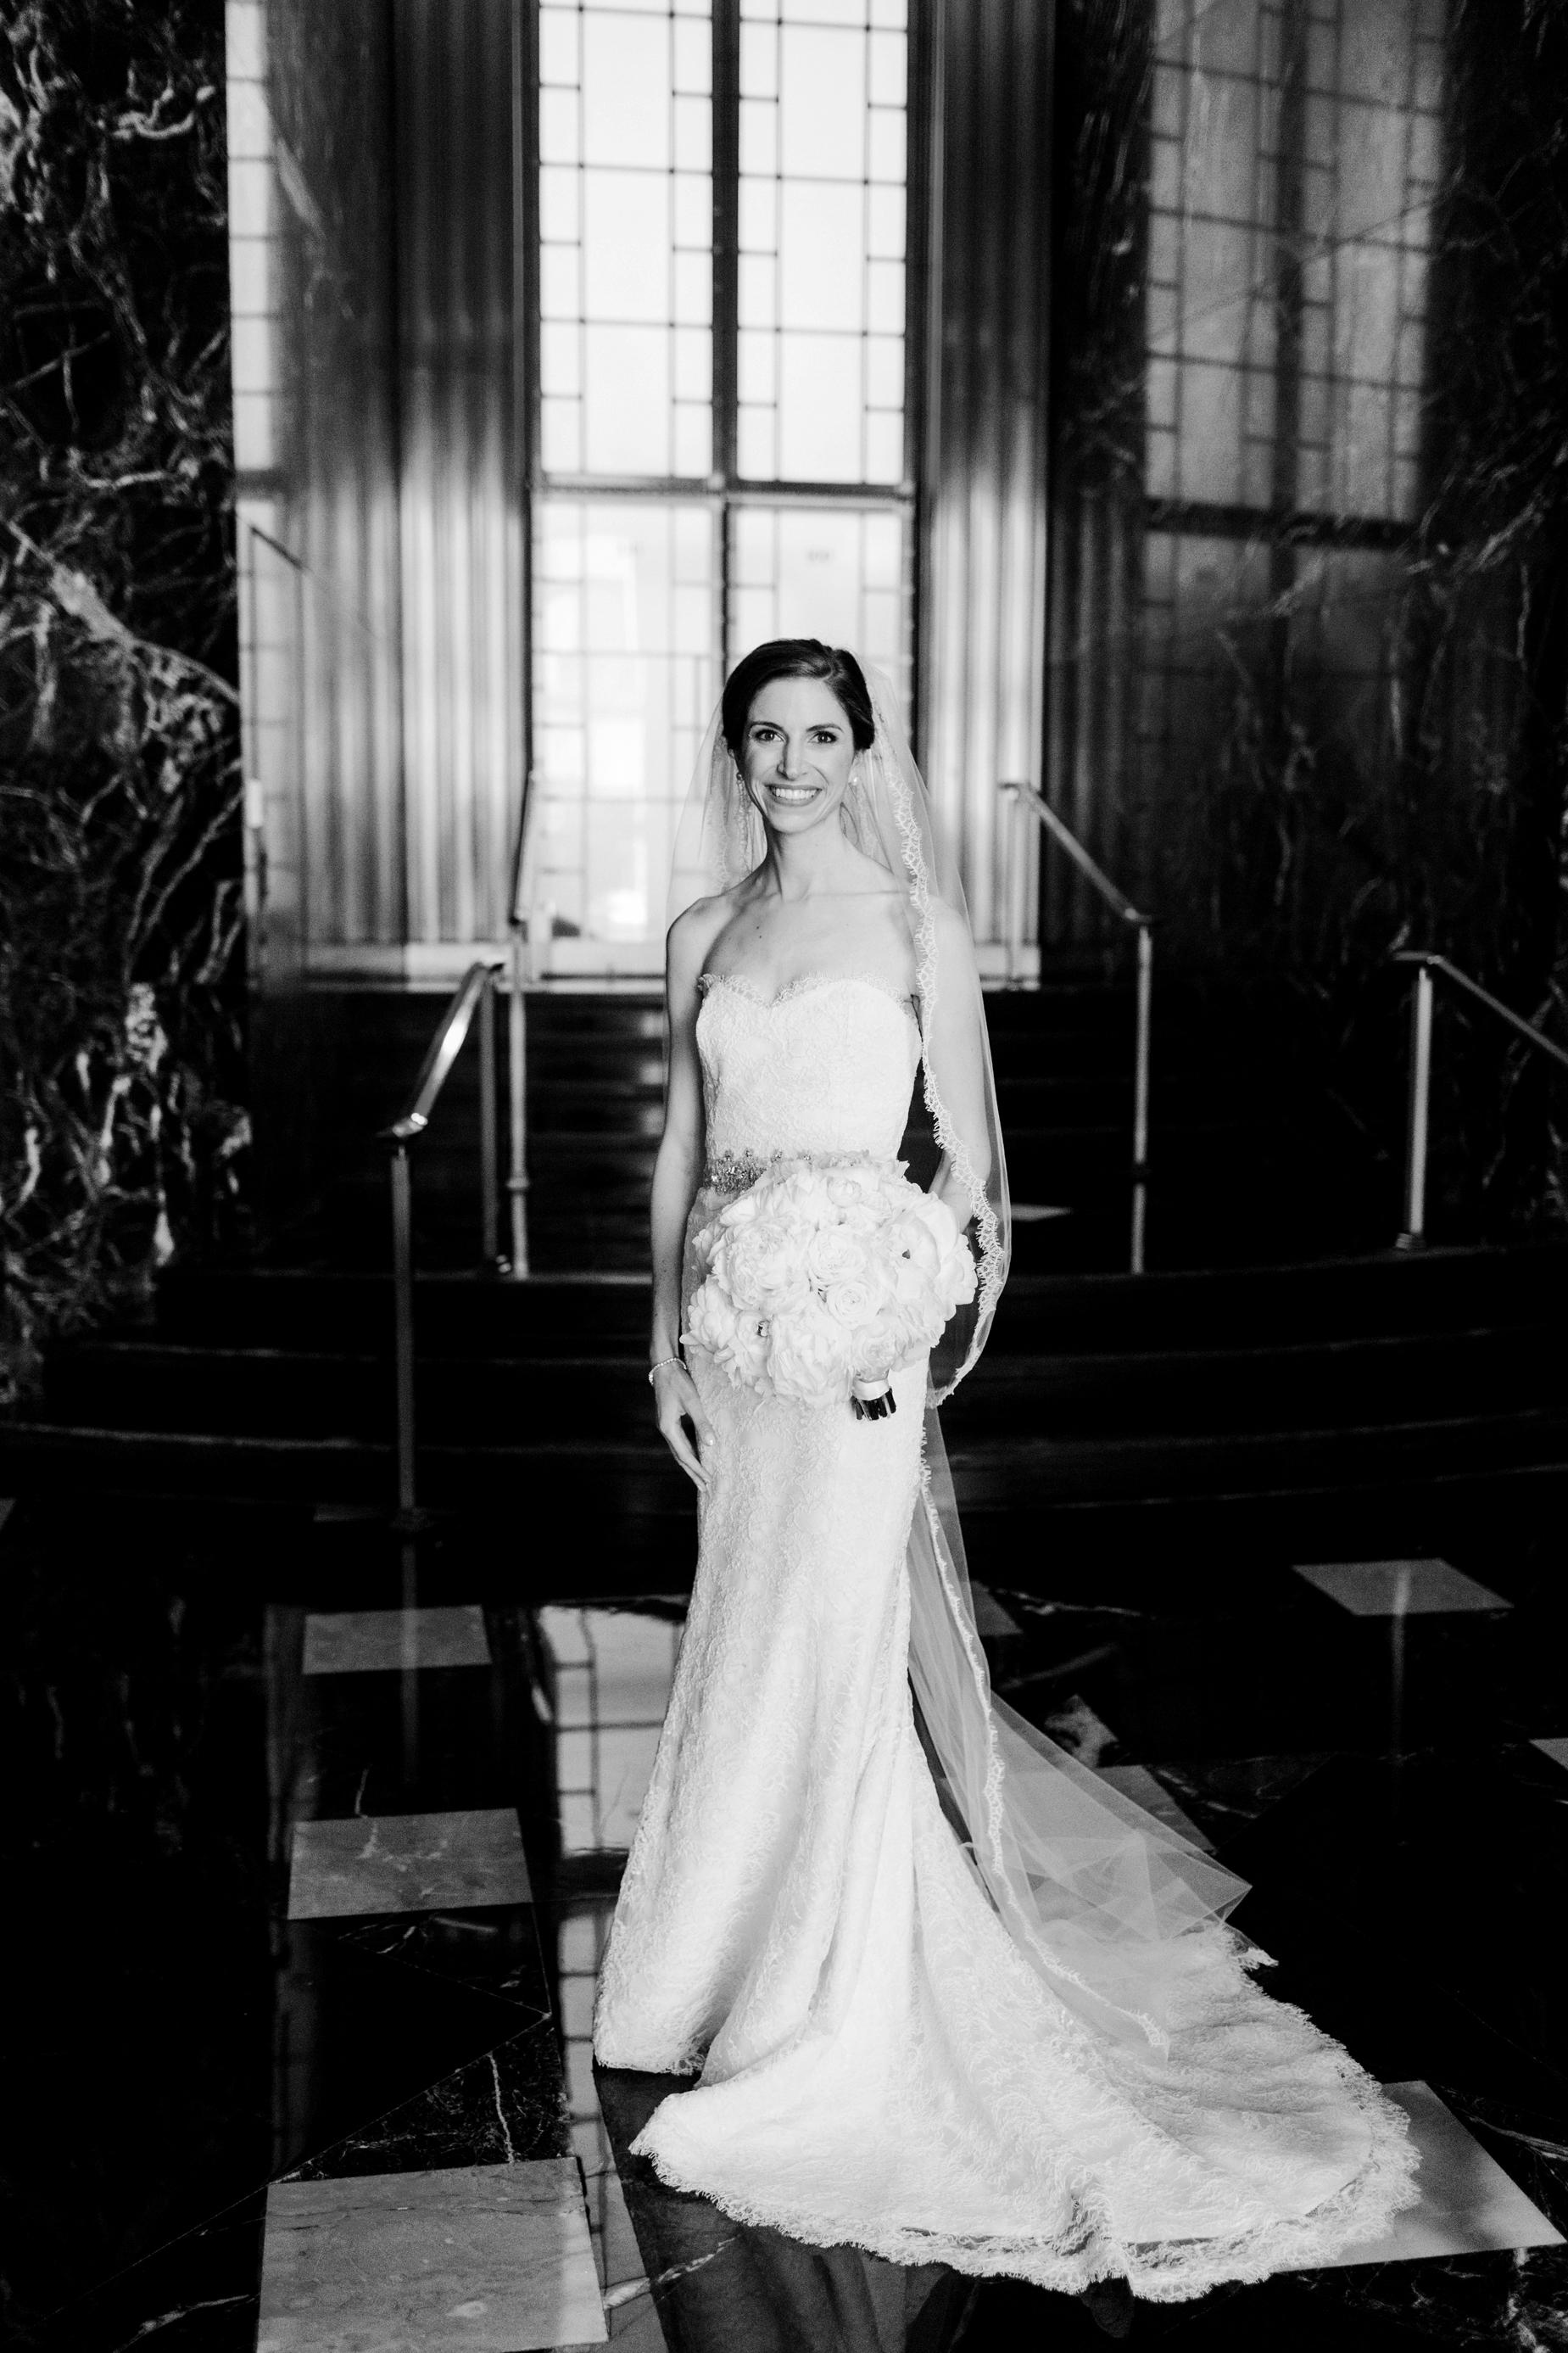 trish-lee-sabrina-lace-trumpet-wedding-dress-13.jpg